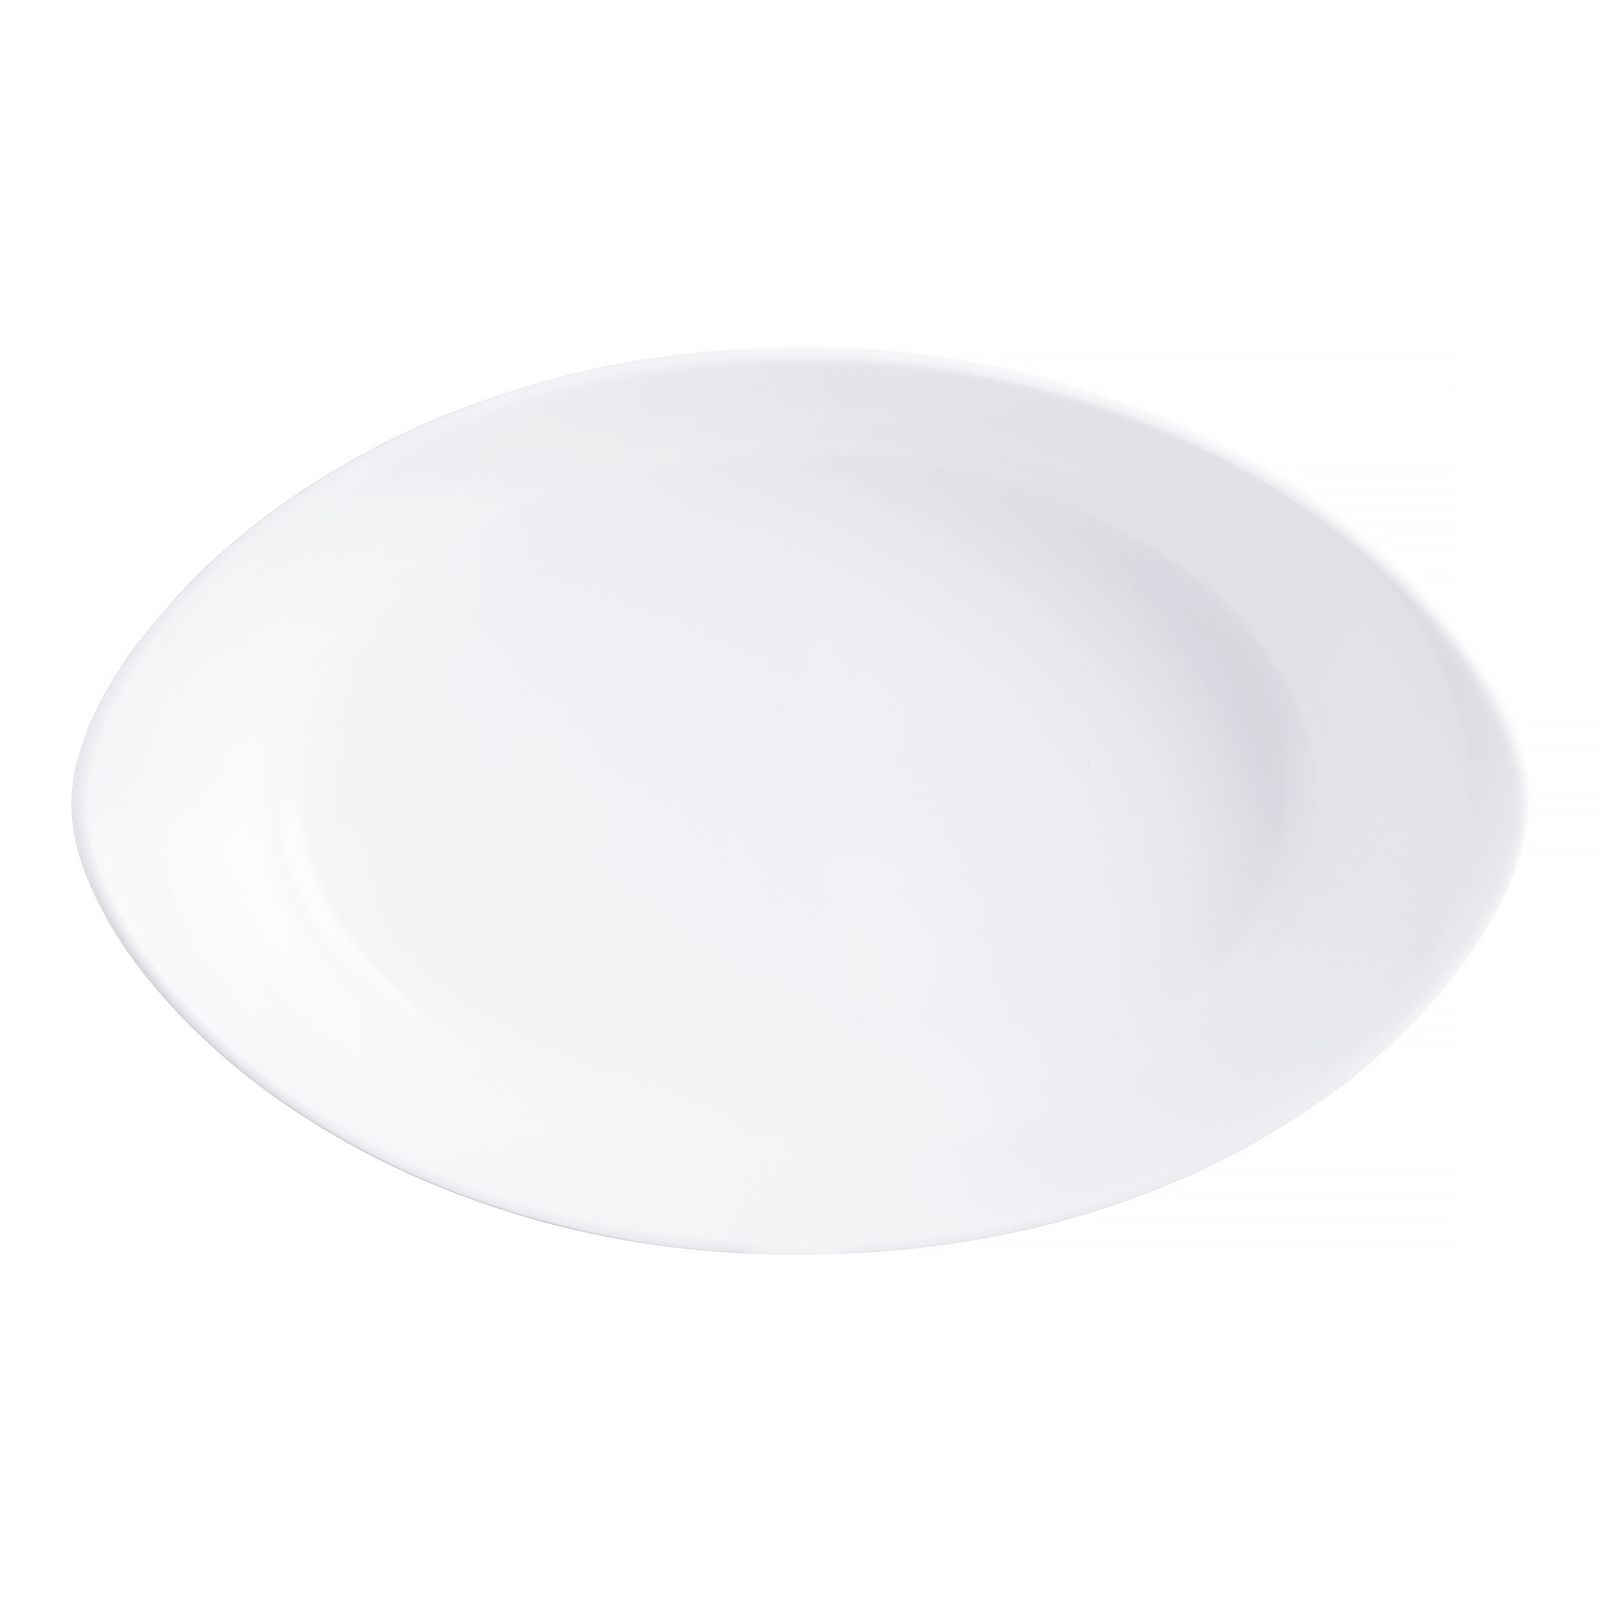 Ugnsform oval Smart Cuisine 38 x 22 cm LUMINARC